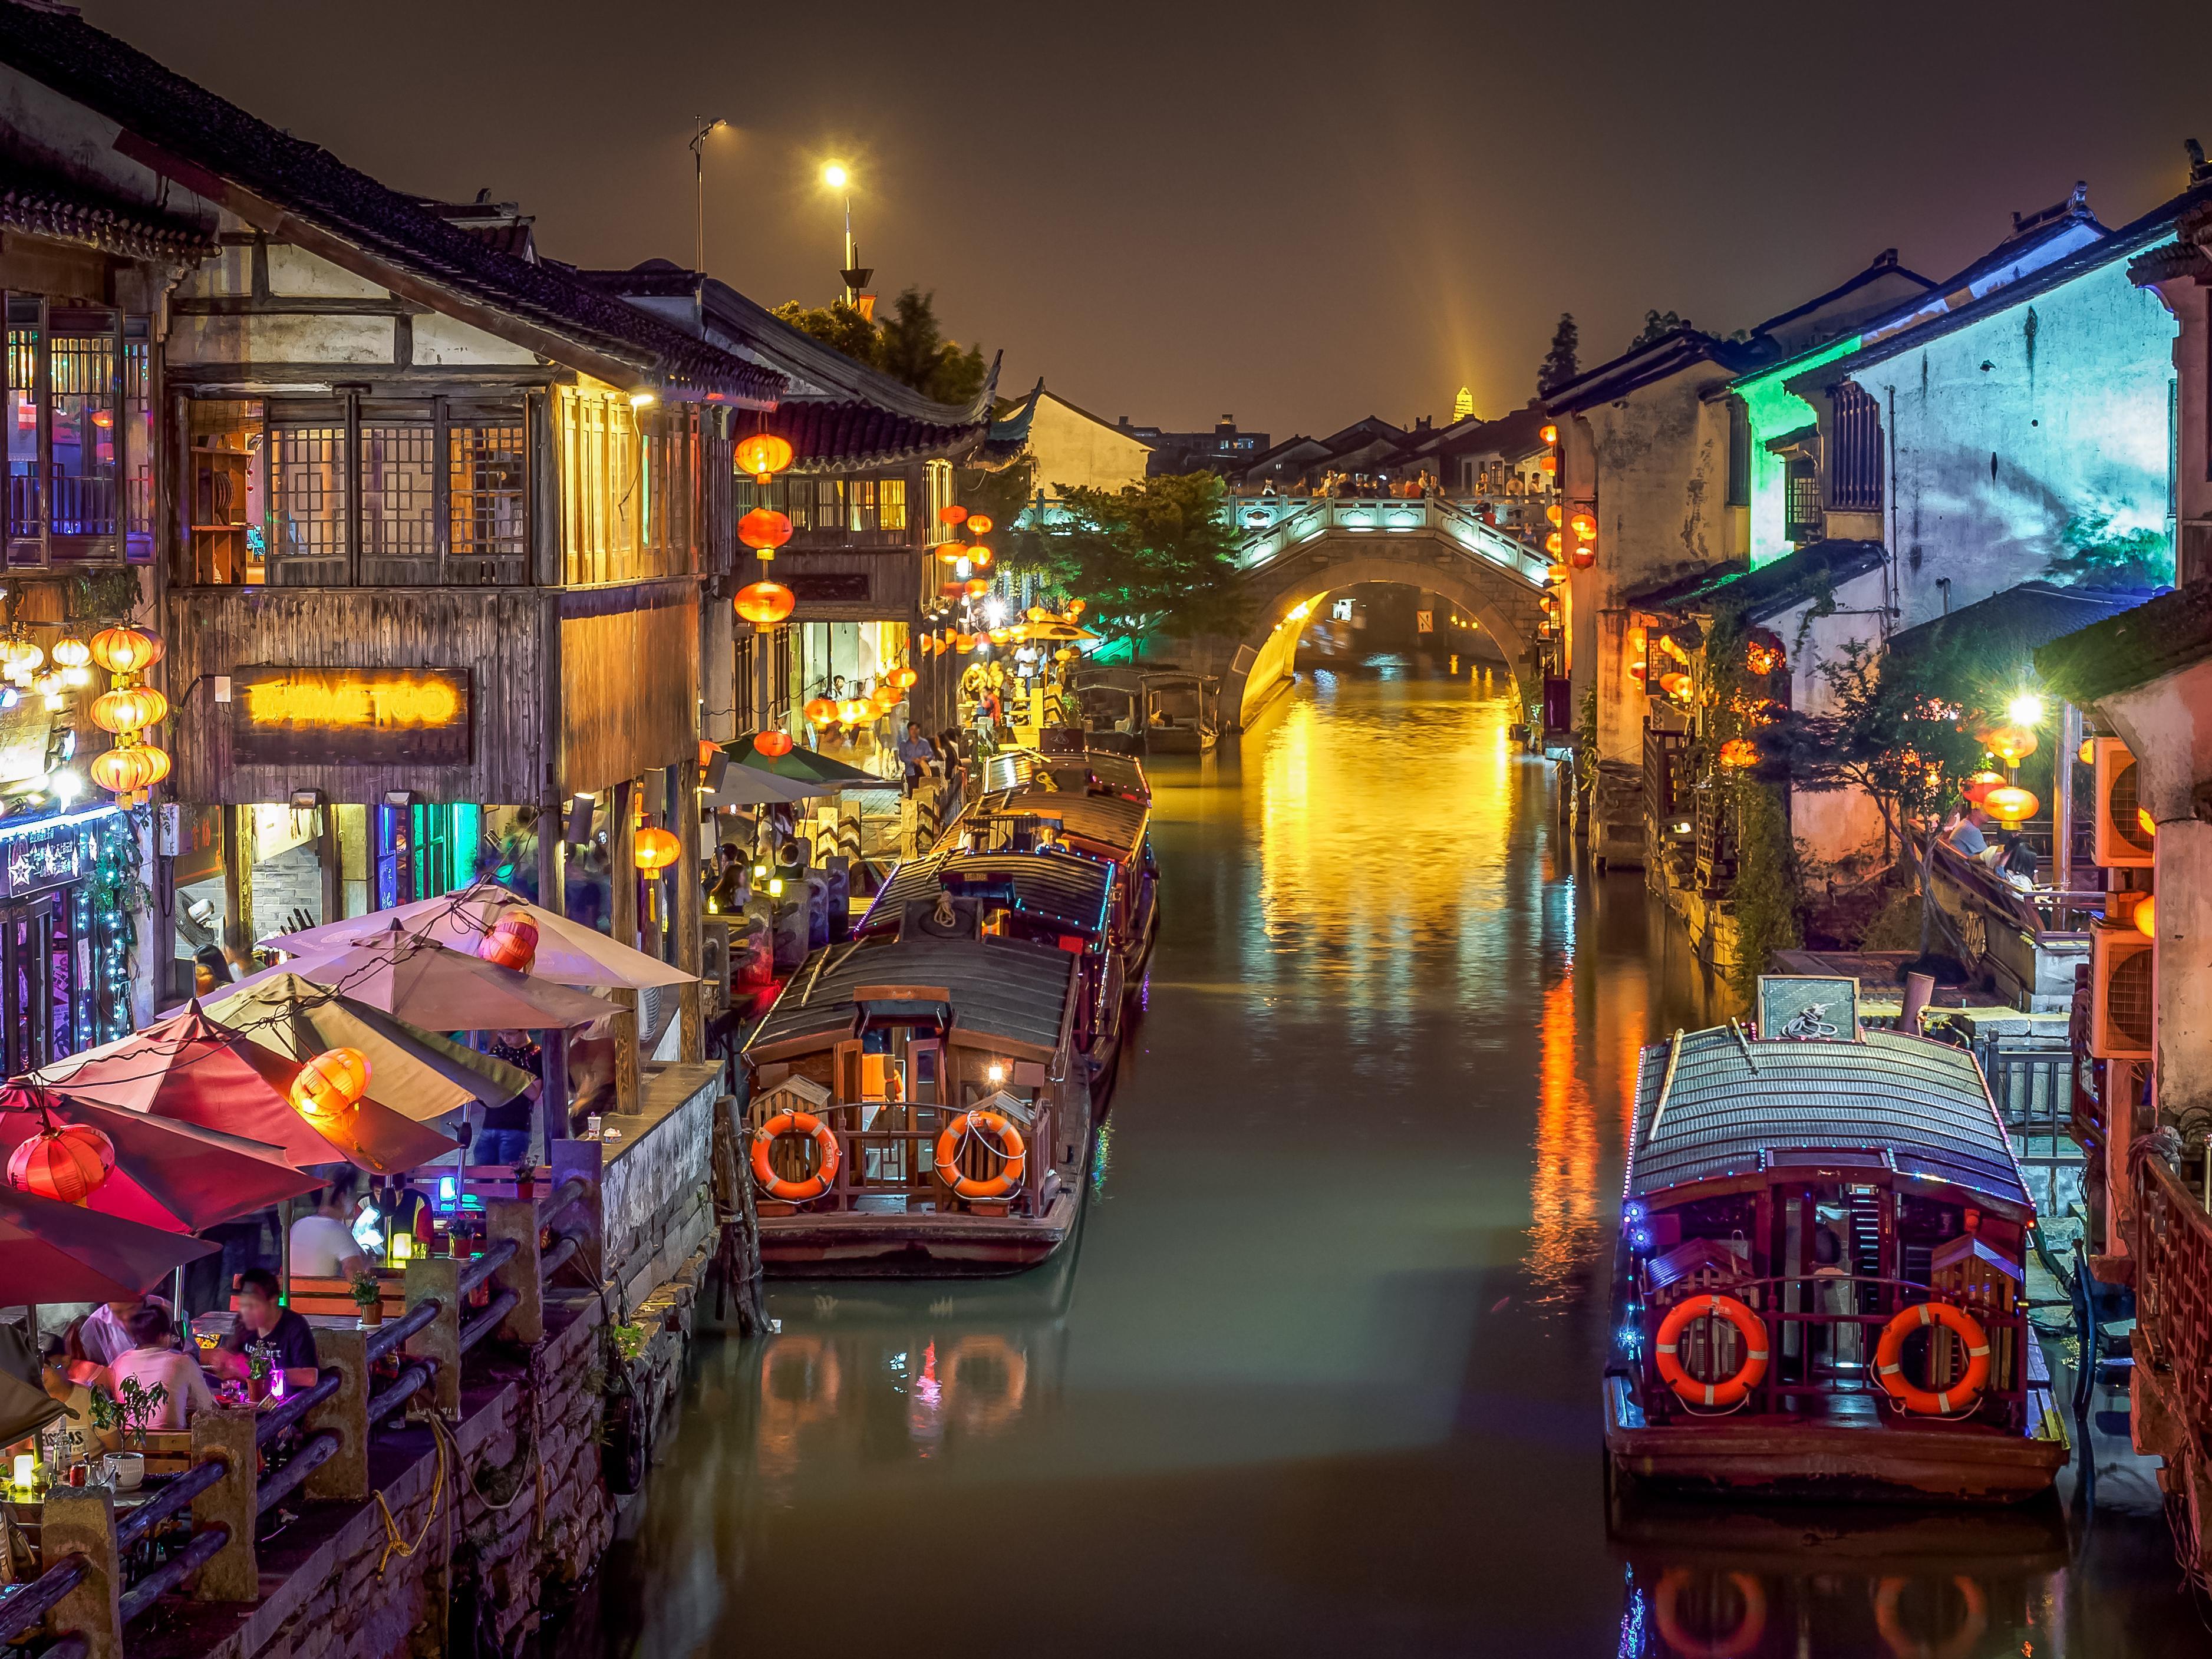 hotels in suzhou from 8 find cheap suzhou hotels with momondo rh momondo com